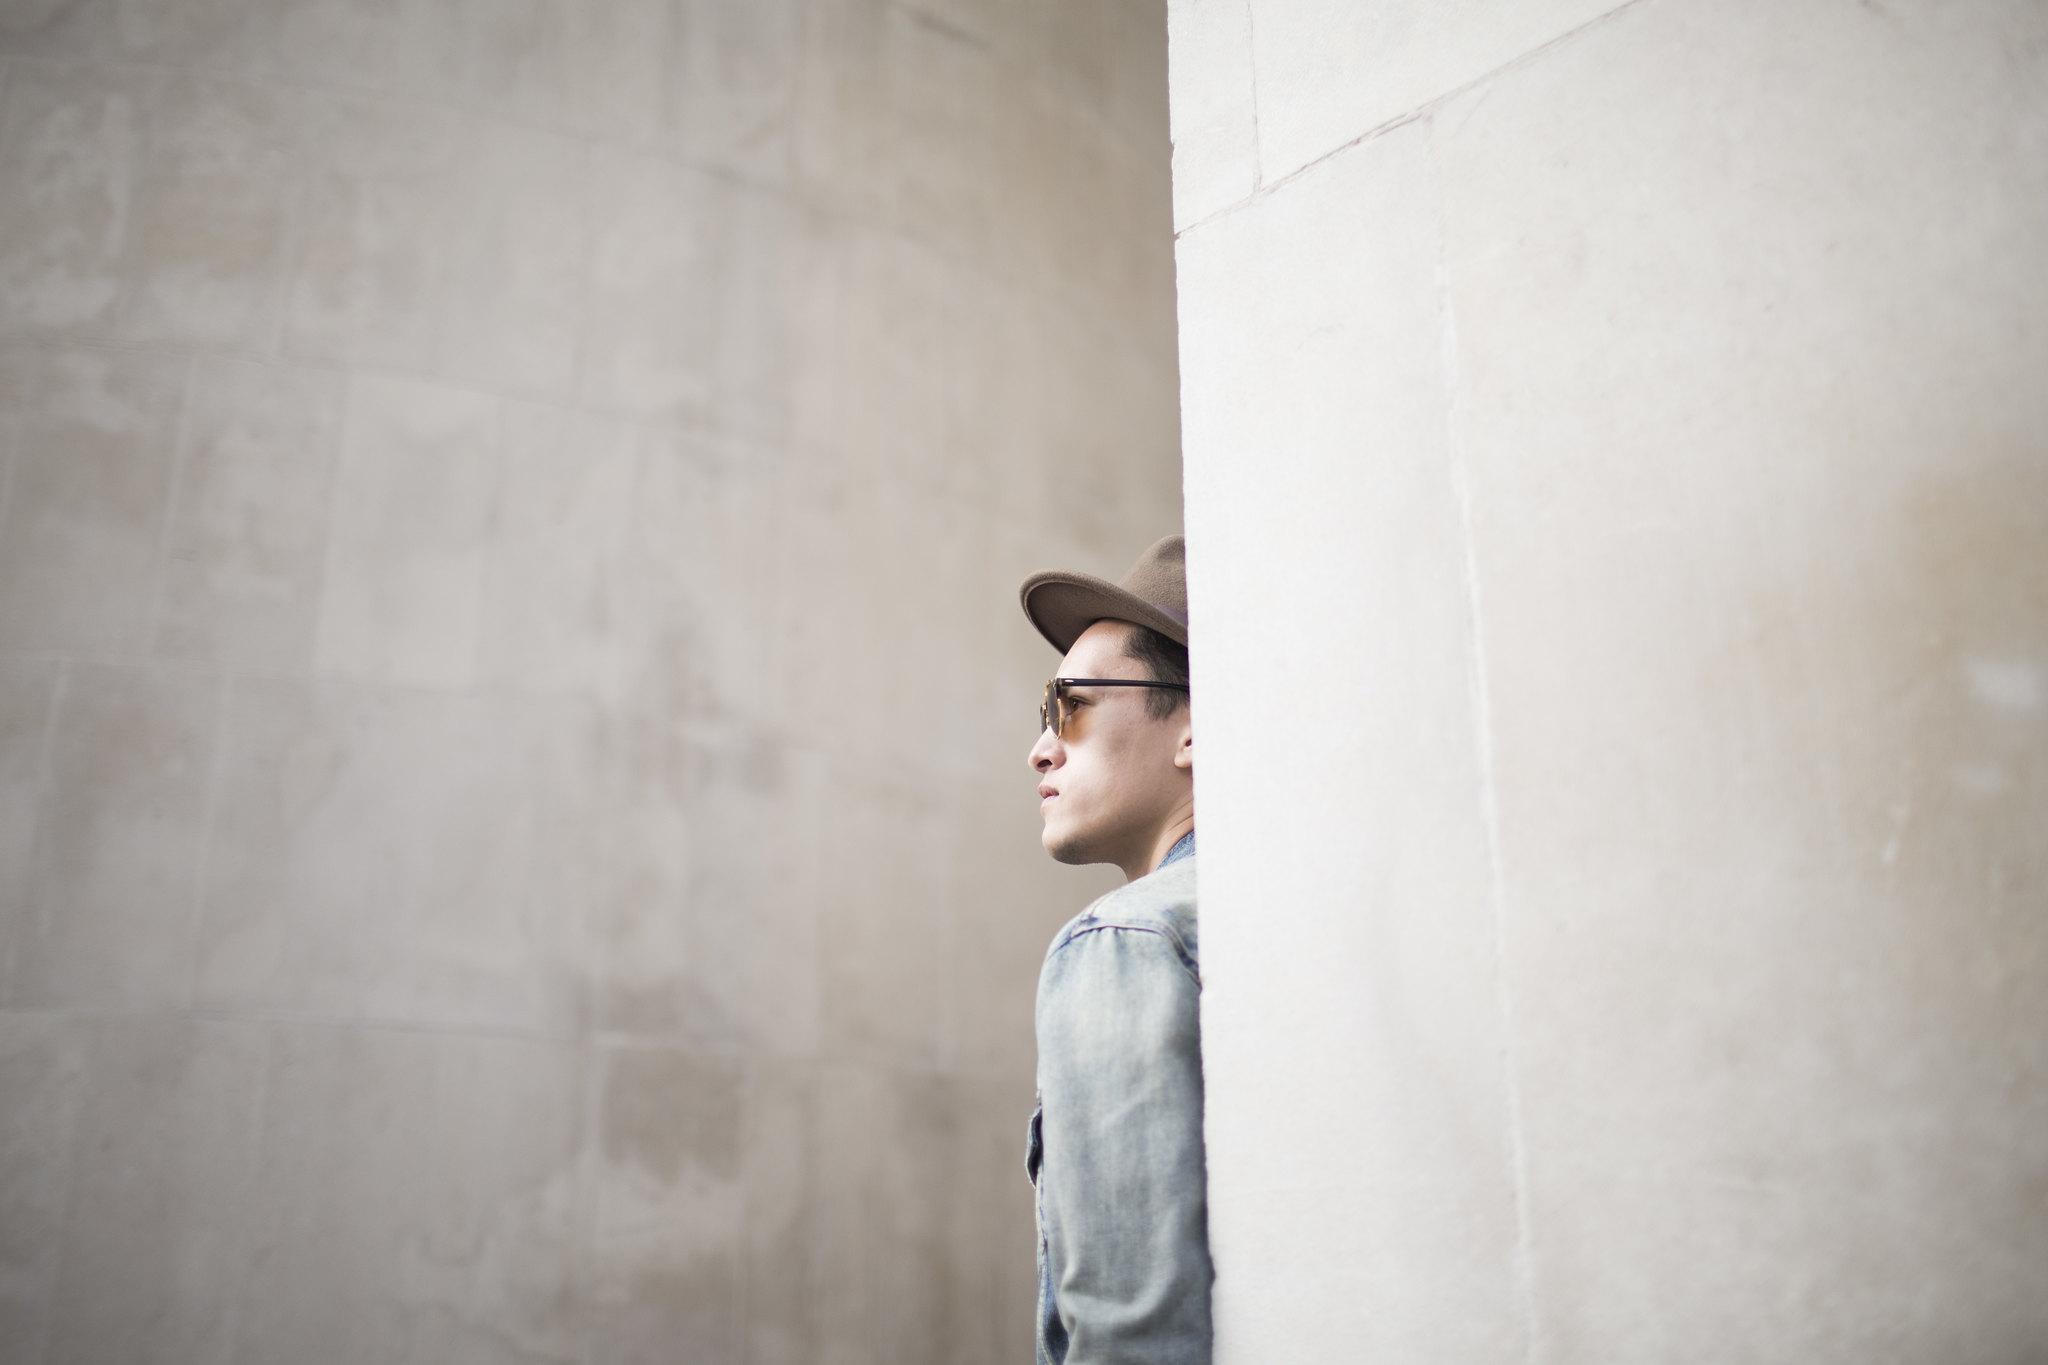 Jordan_Bunker_grey_sweatshirt_3